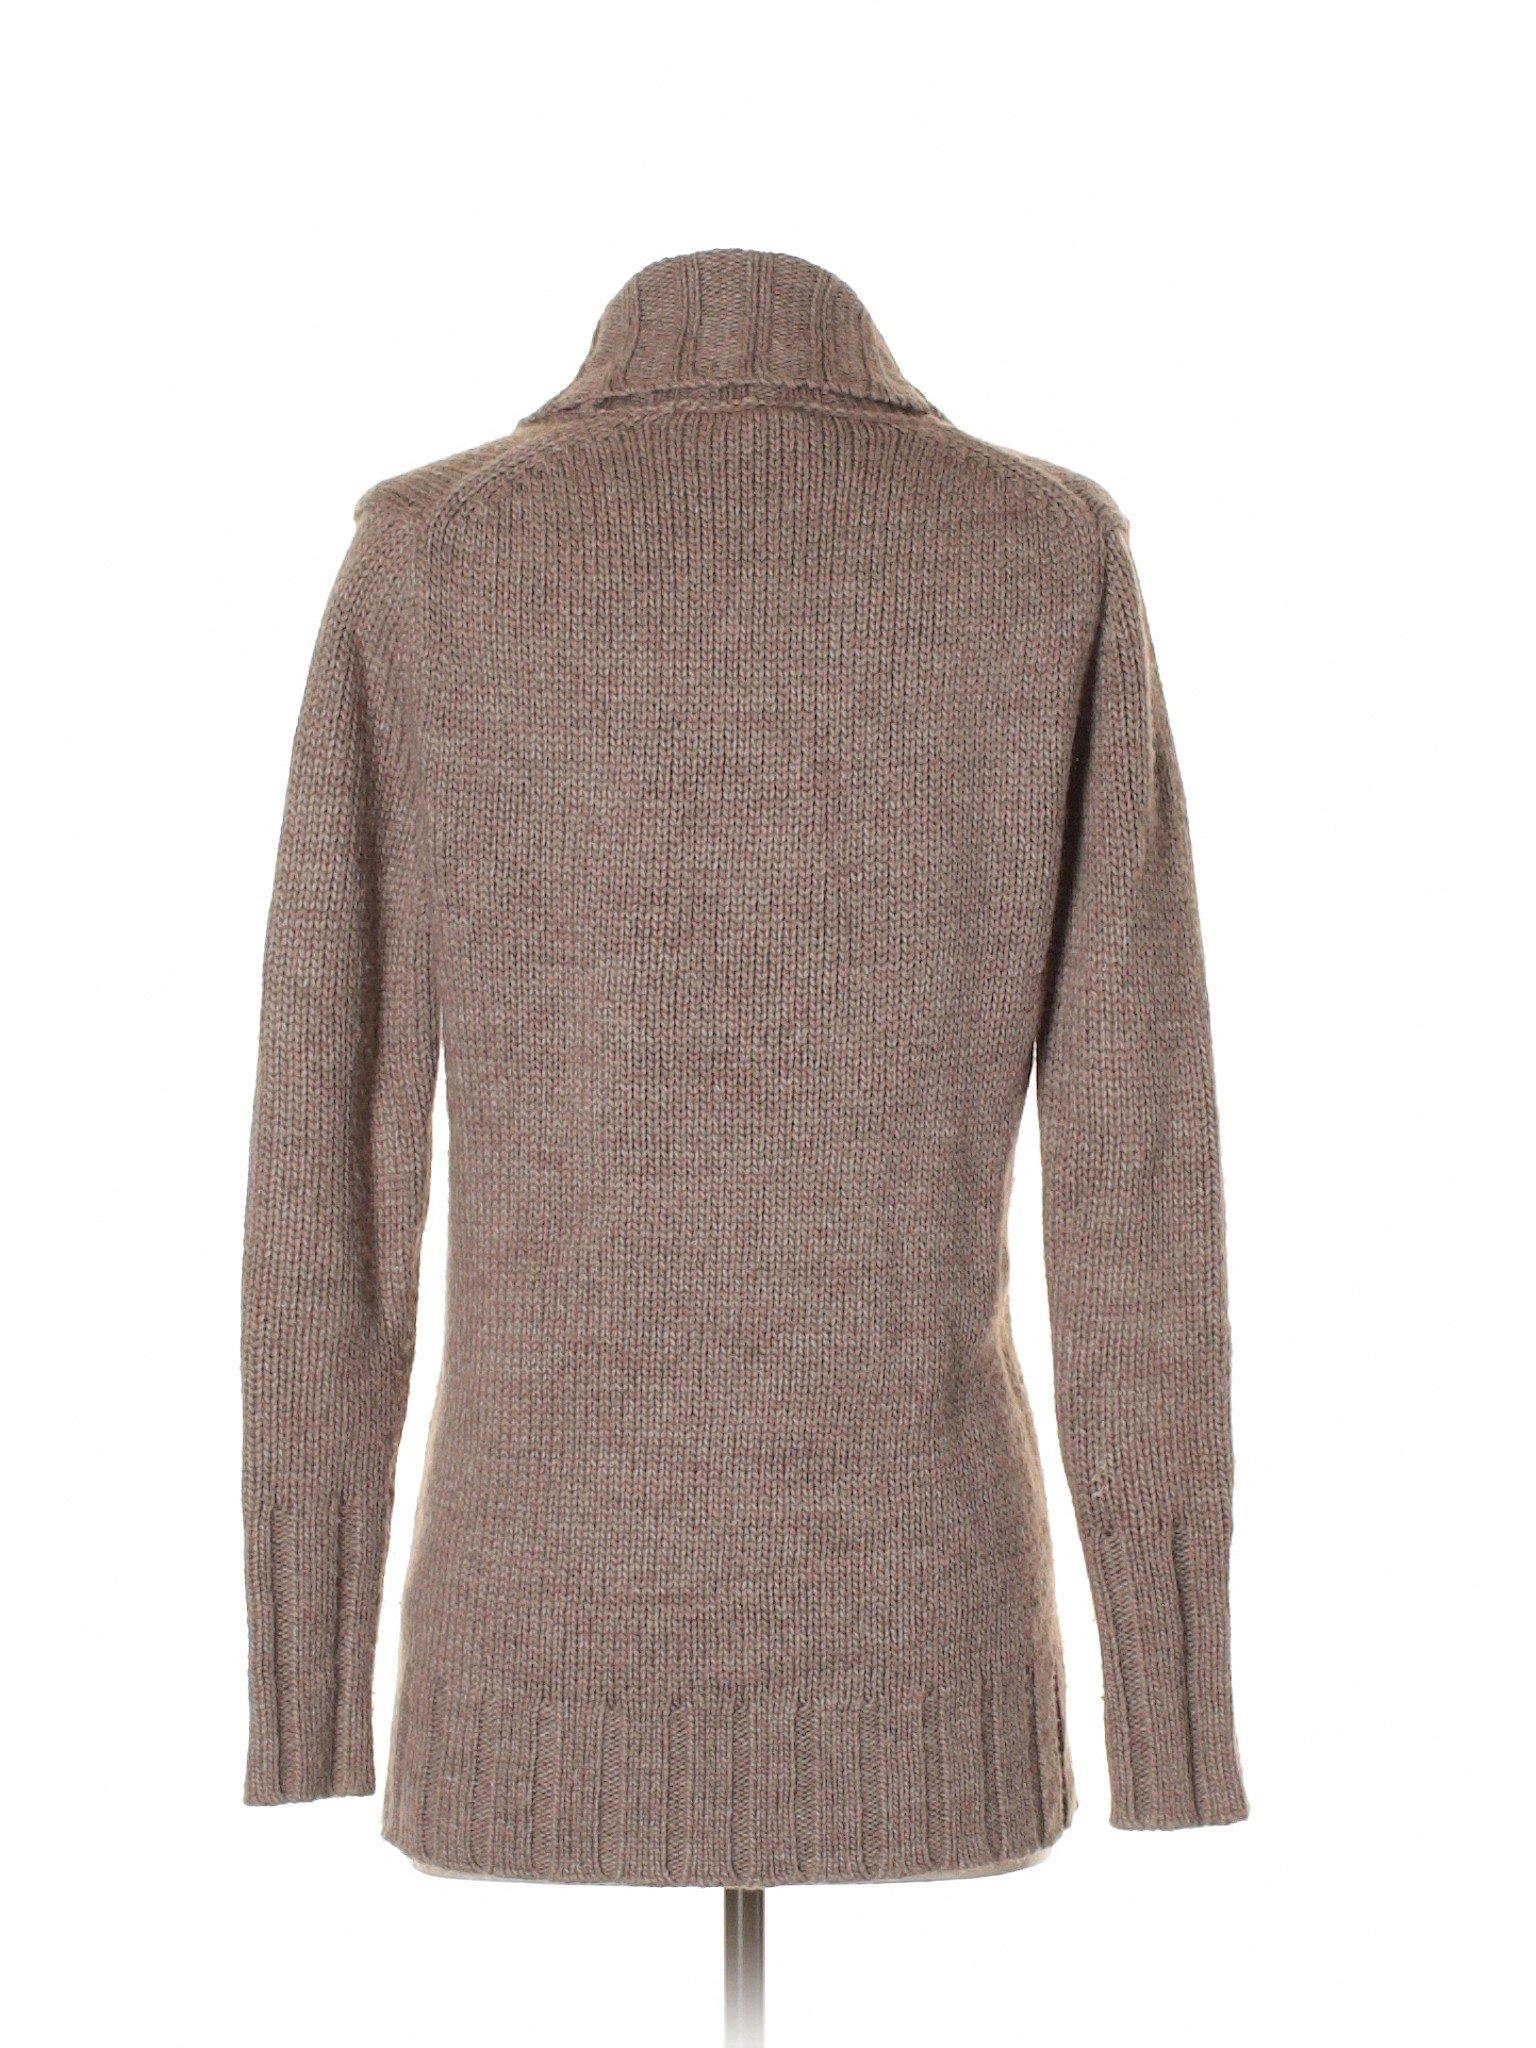 Winter J Sweater Pullover Boutique Crew dBPwYzdq